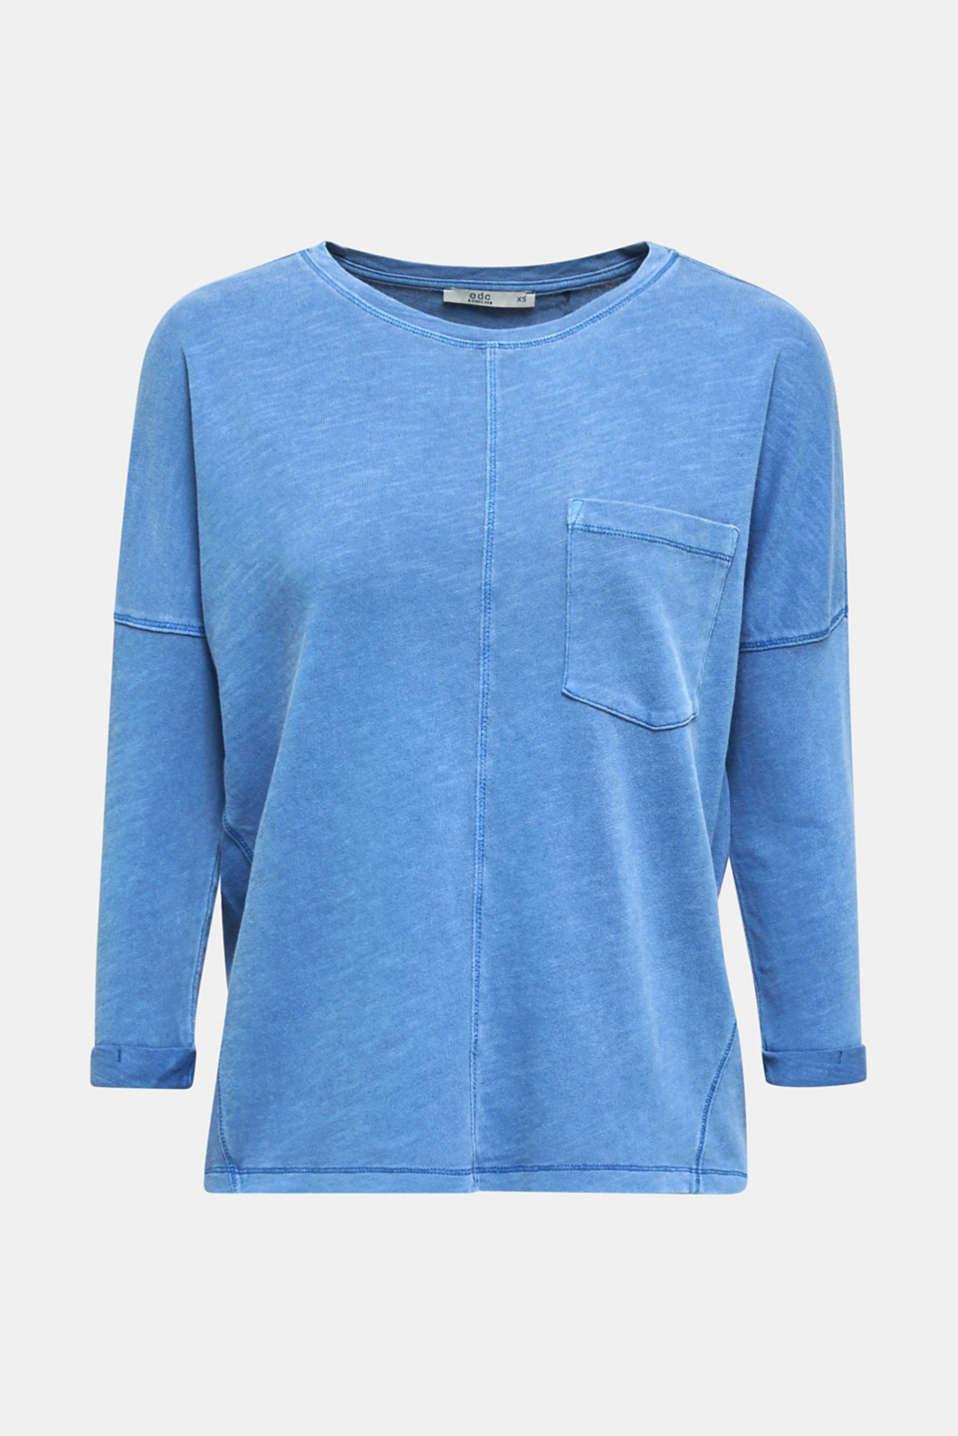 NEON slub T-shirt with a pocket, 100% cotton, BRIGHT BLUE, detail image number 5